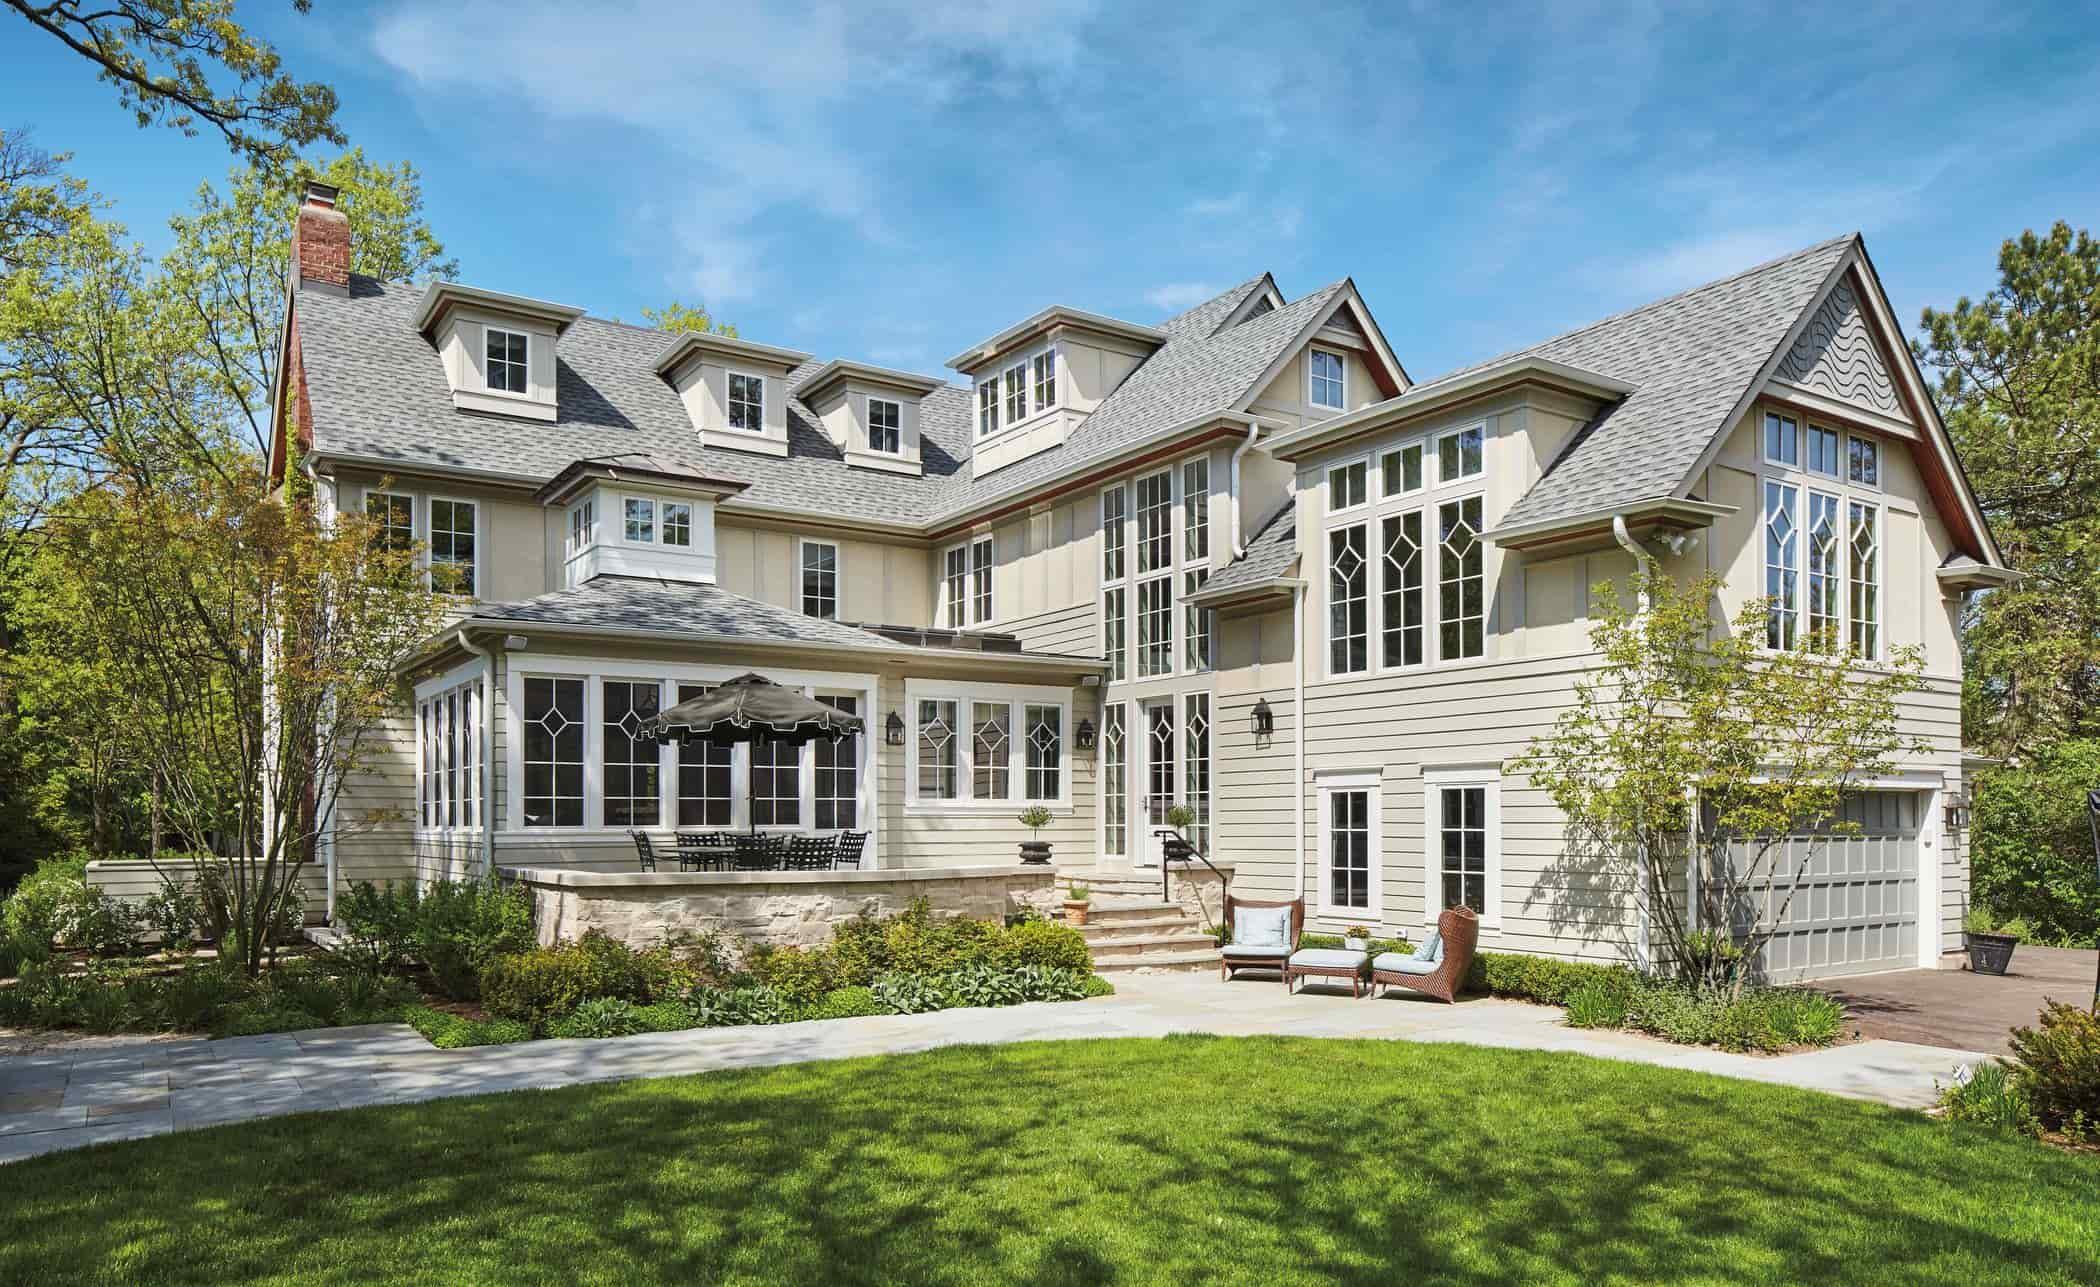 Elegant custom built home with custom windows